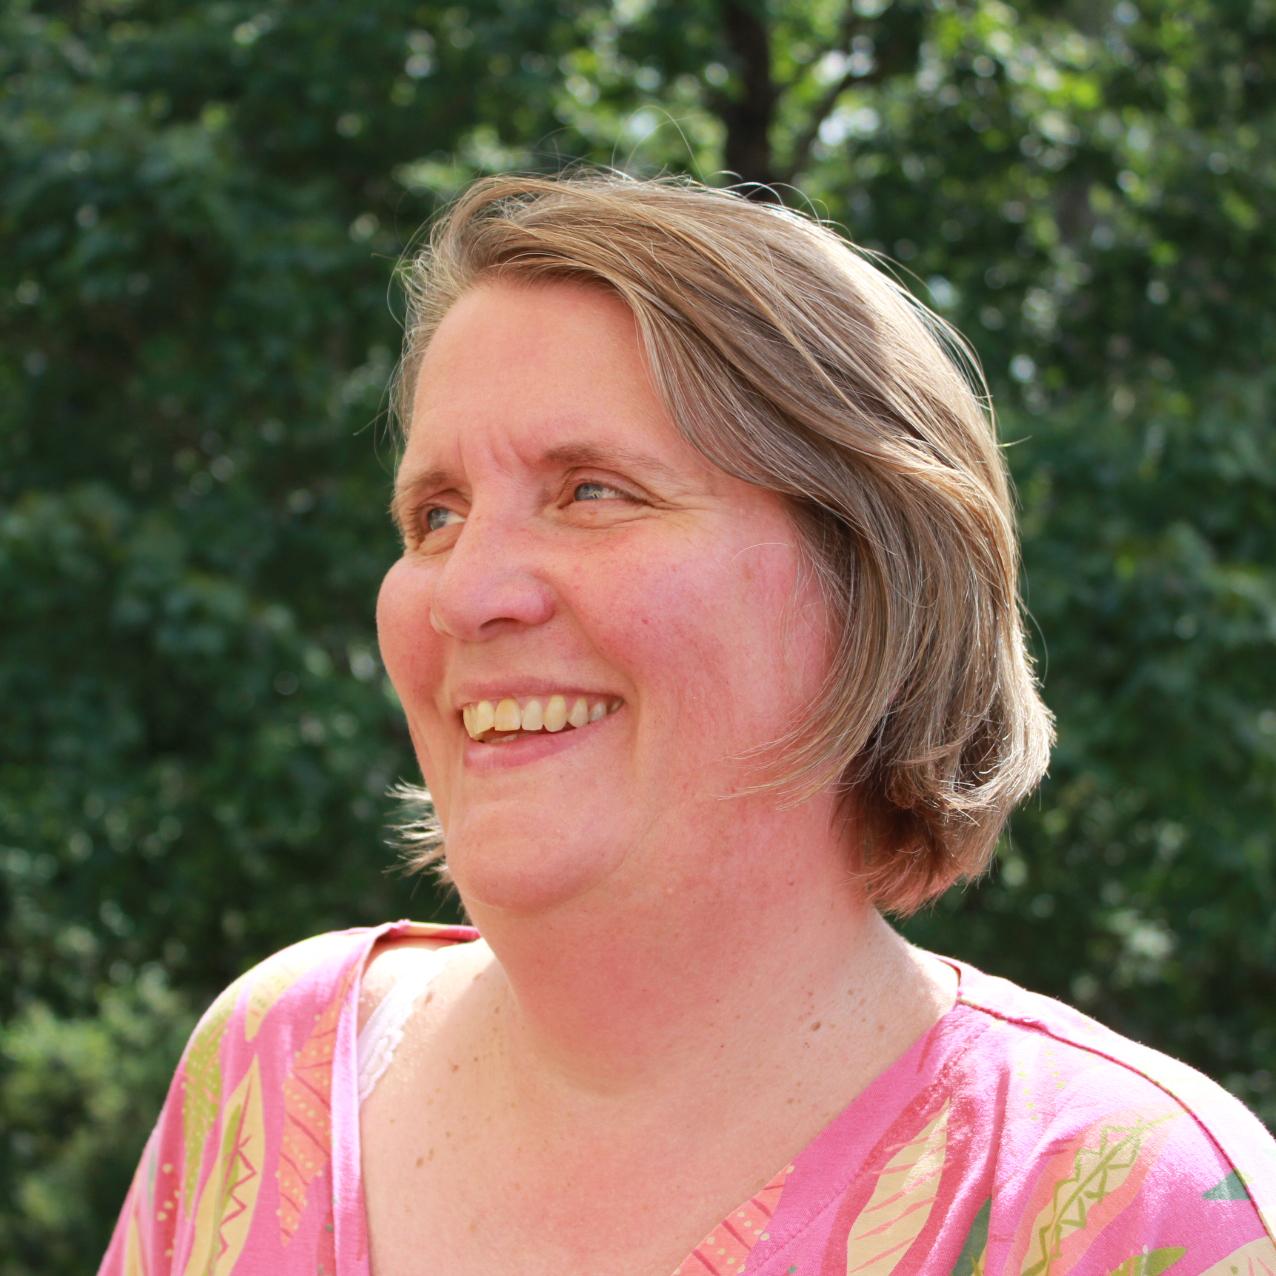 Pernilla Zetterlund Lind